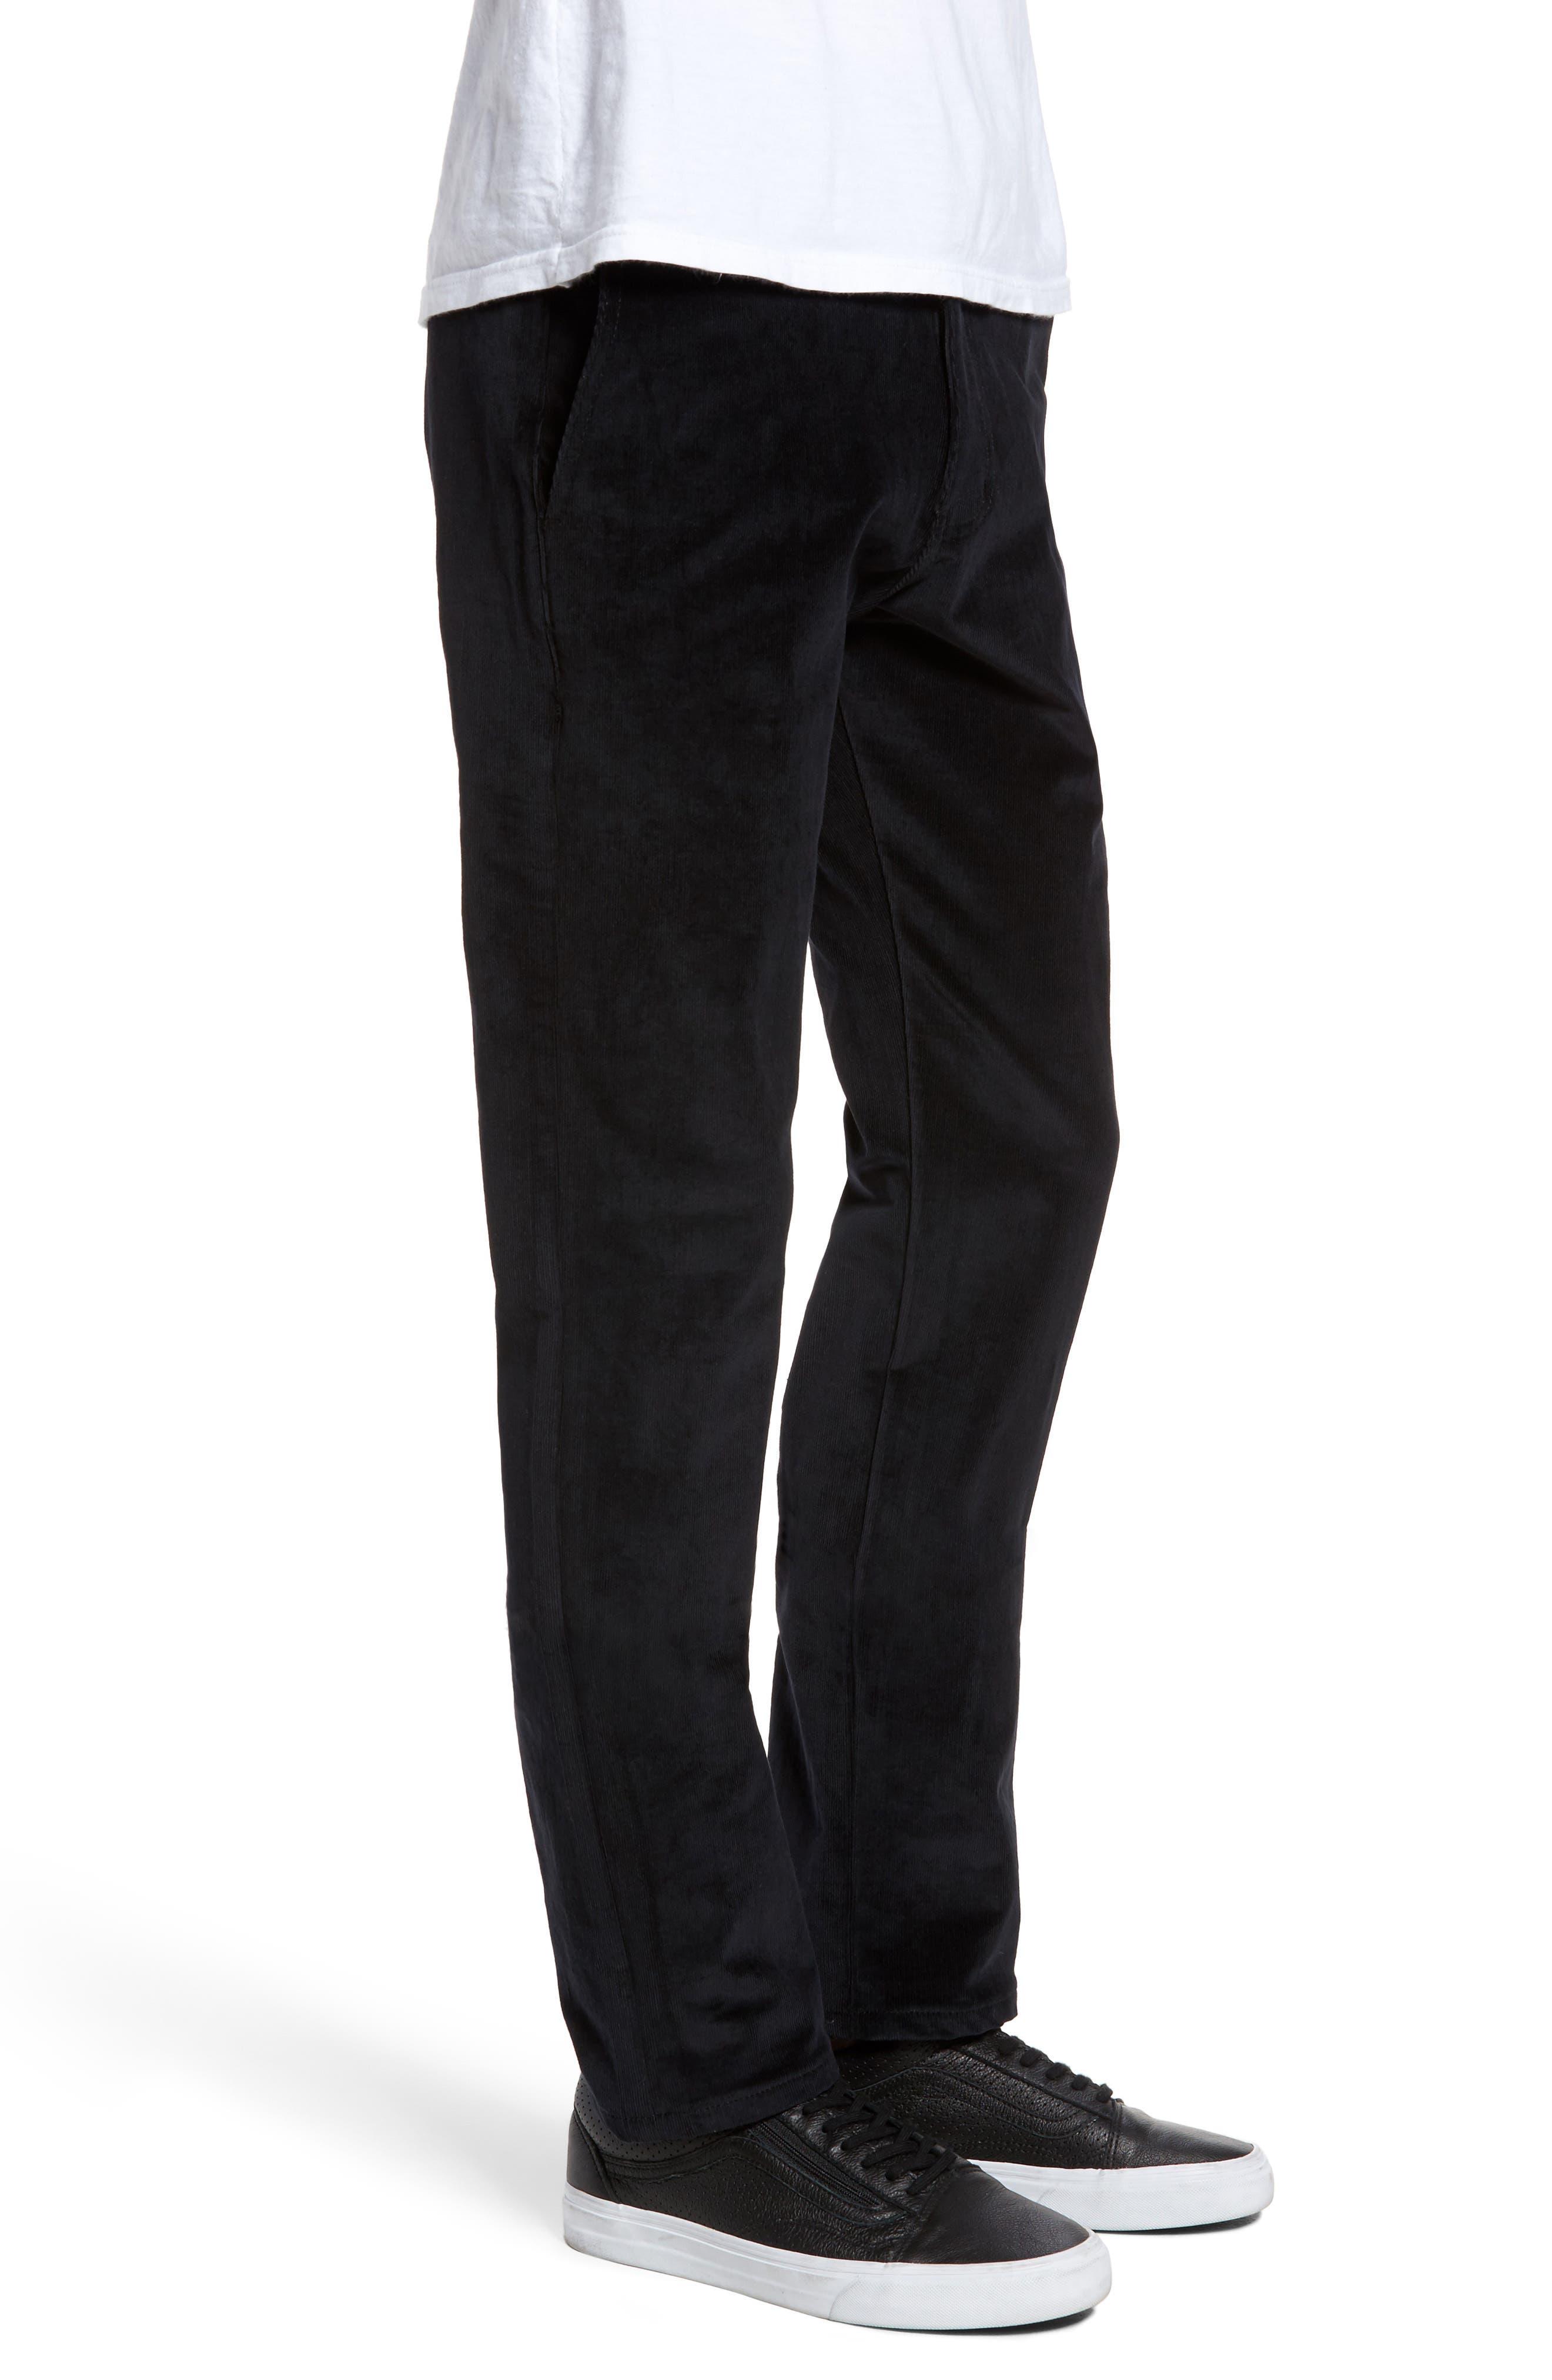 Naked & Famous Slim Chino Slim Fit Corduroy Pants,                             Alternate thumbnail 3, color,